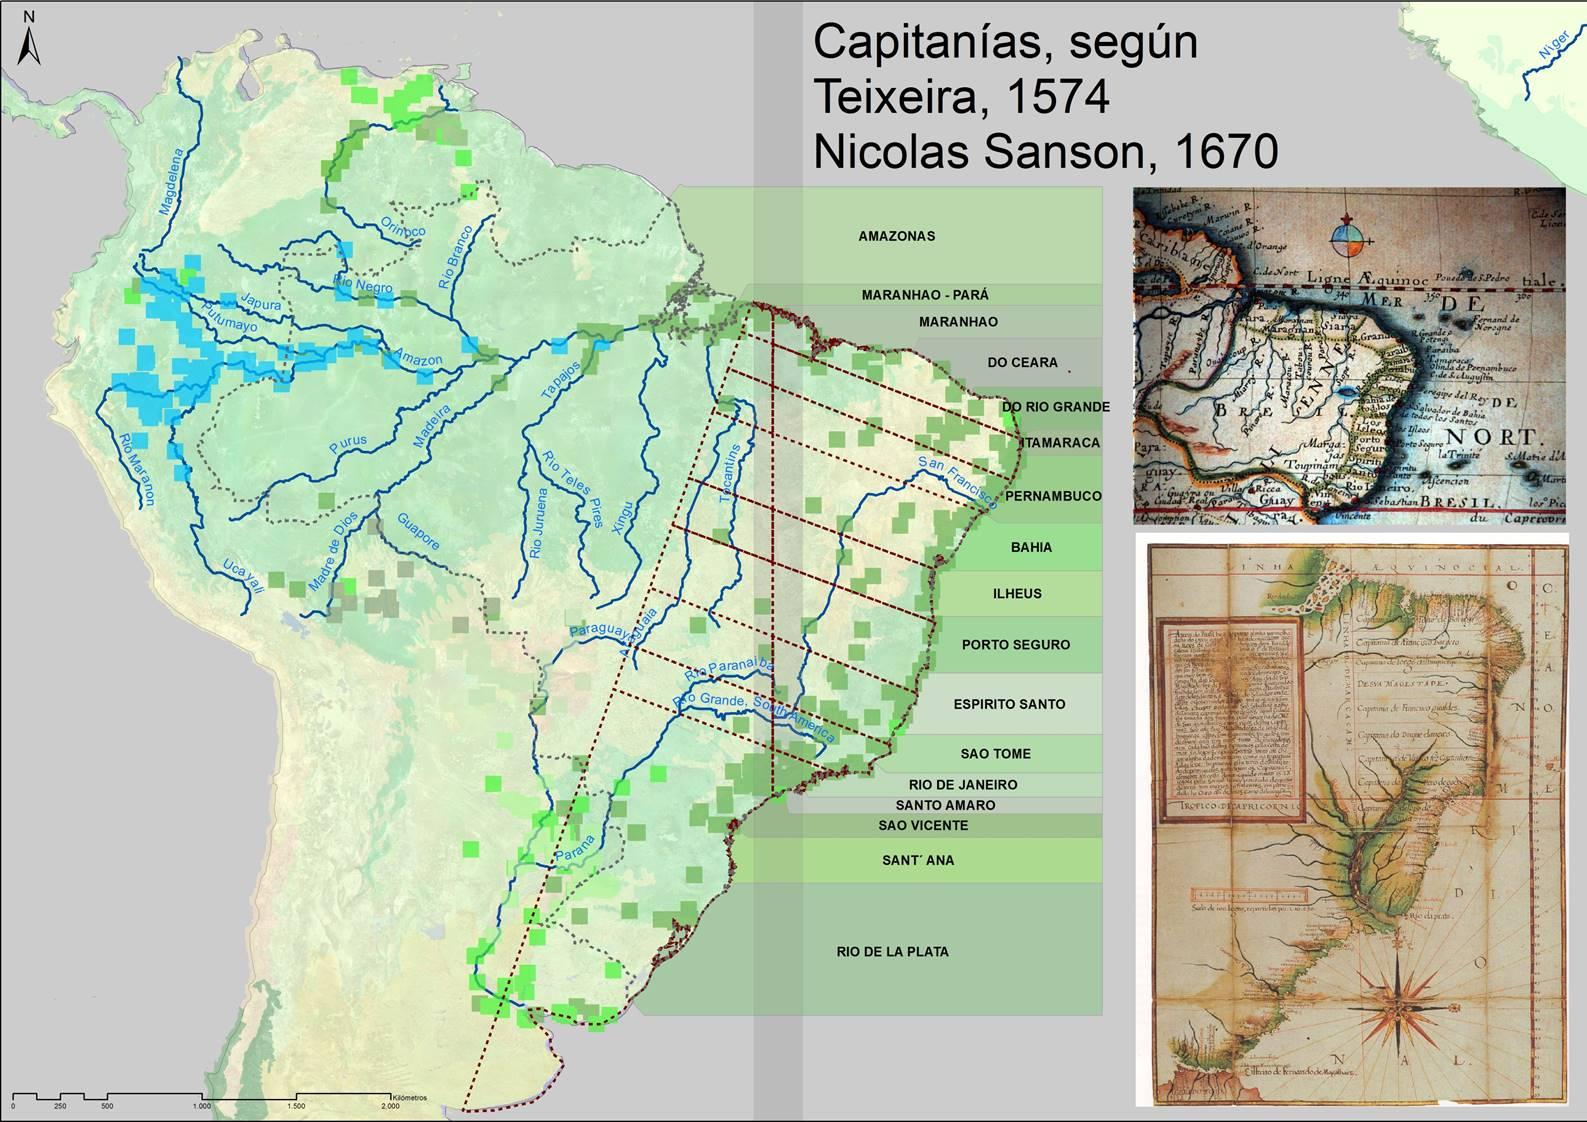 Las primeras capitanías hereditarias